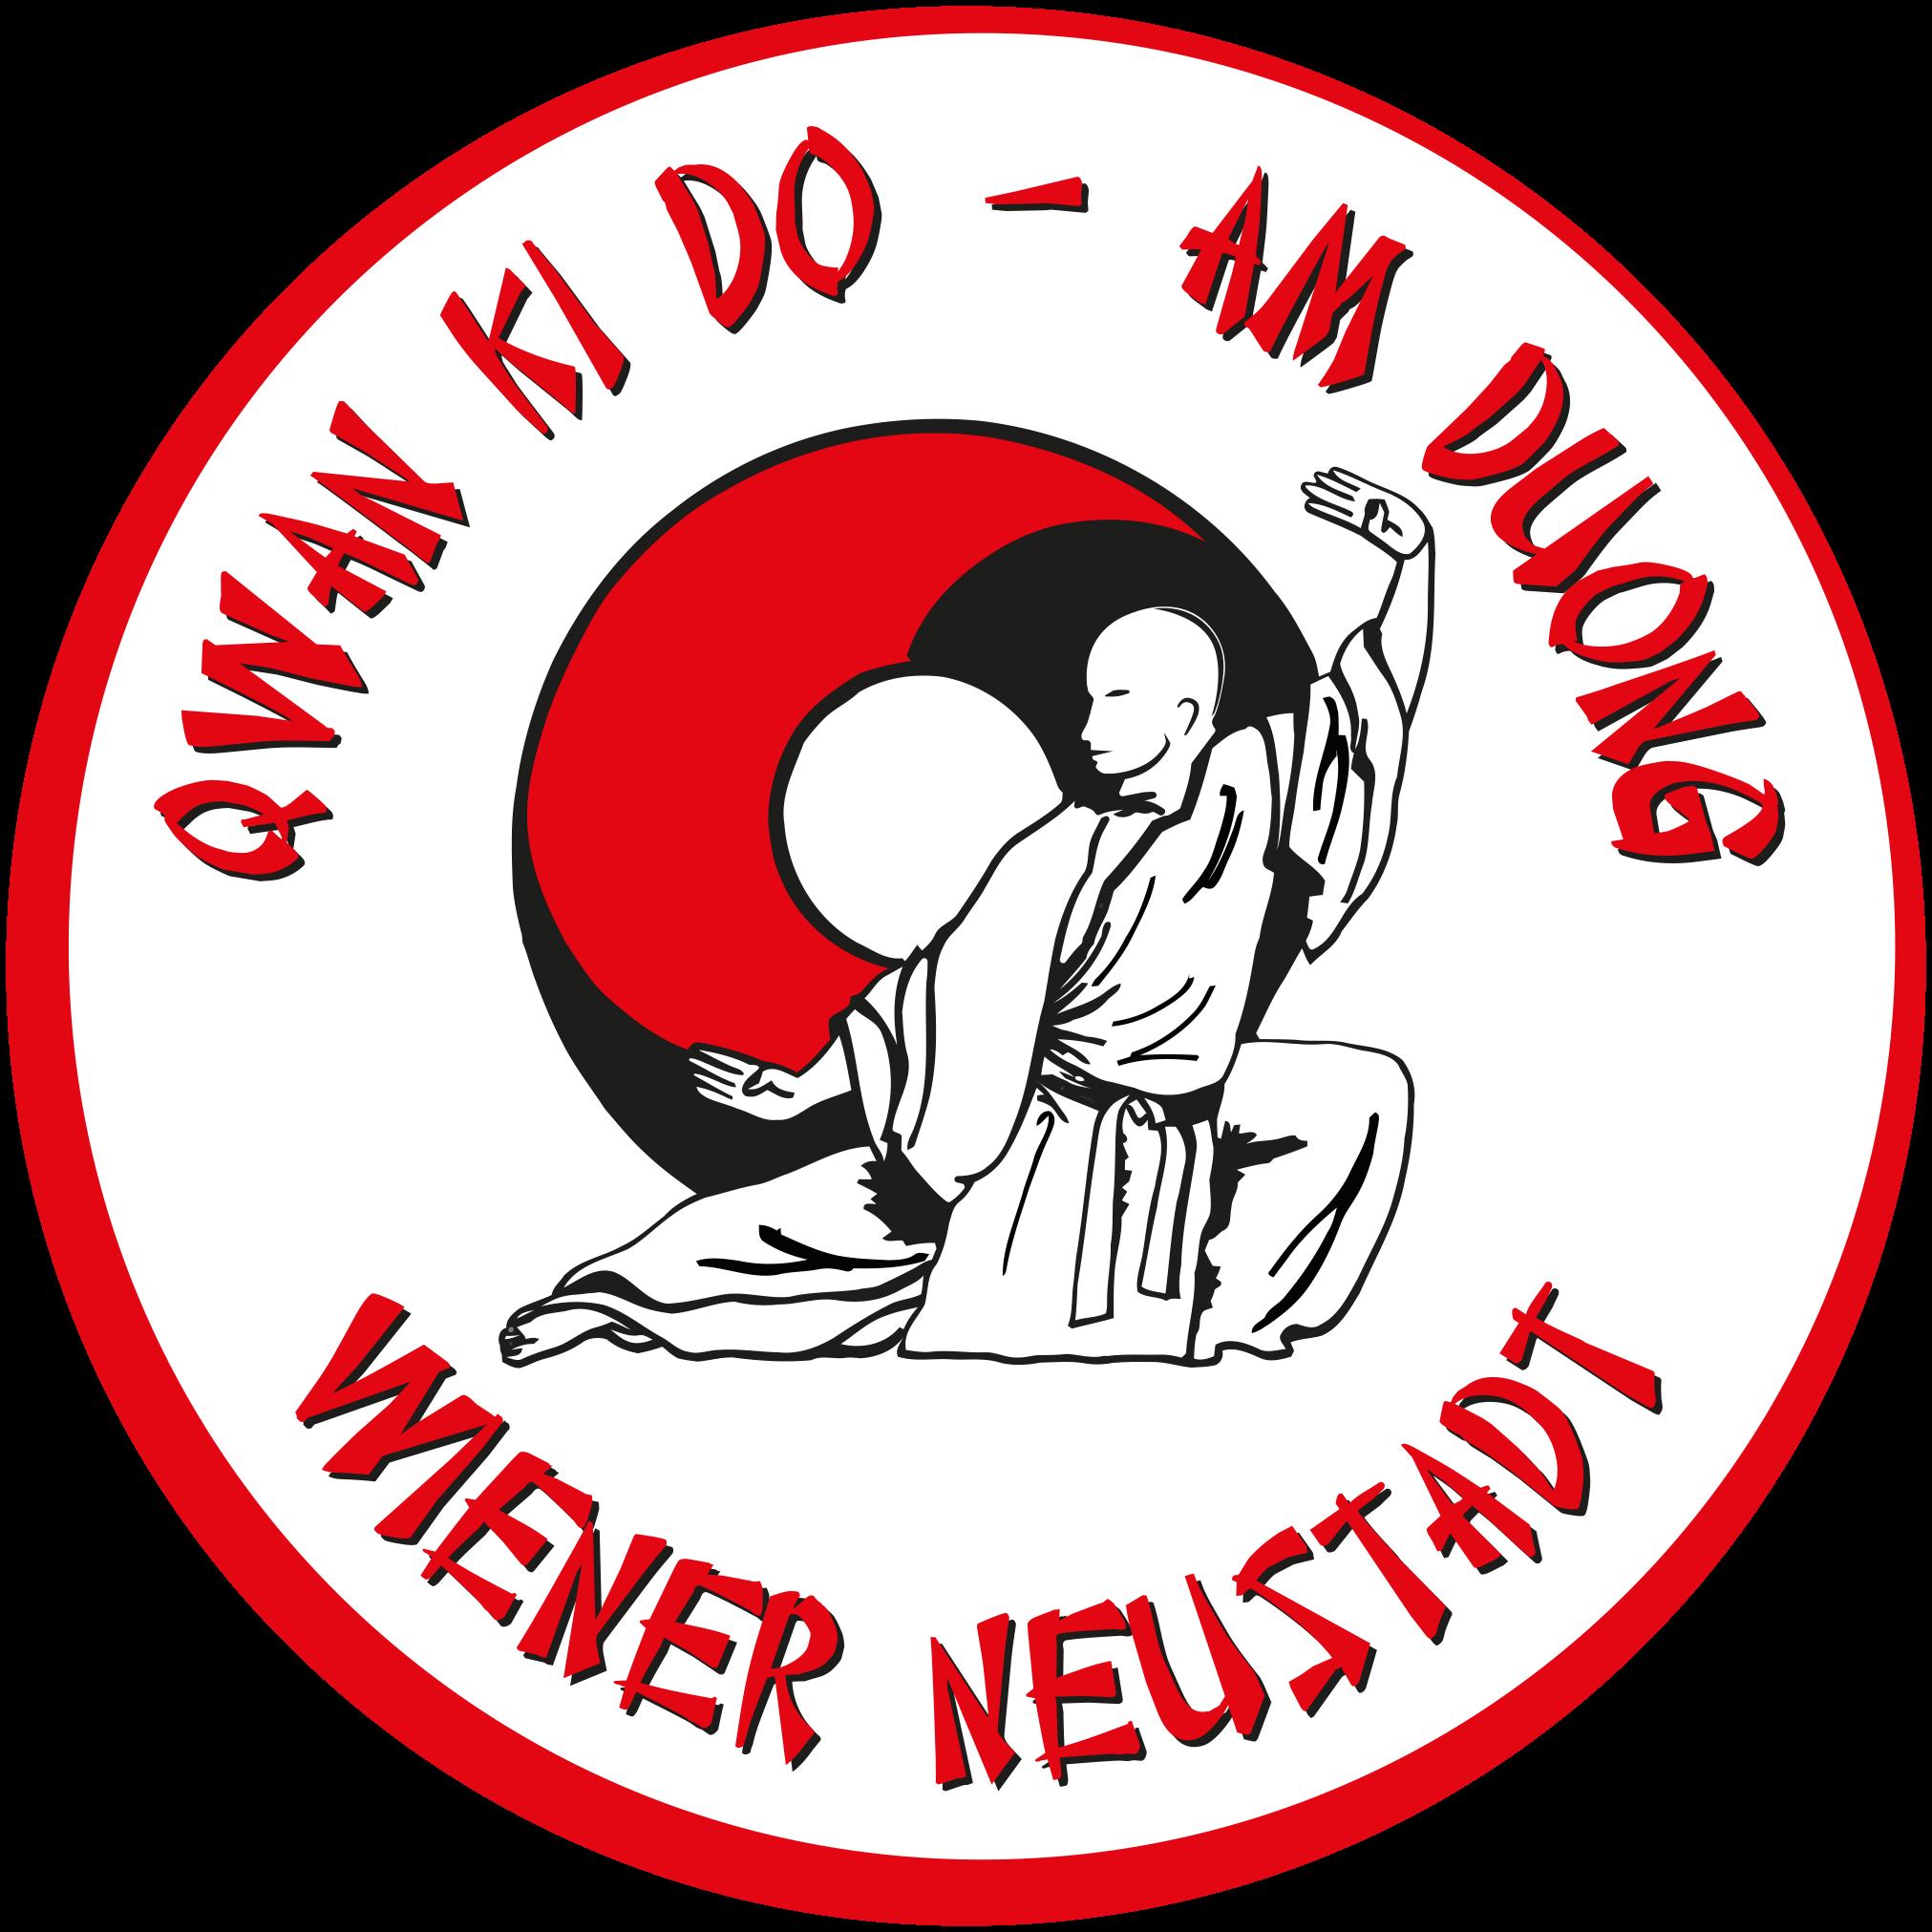 Logo_QWAN KI DO_Wr. Neustadt